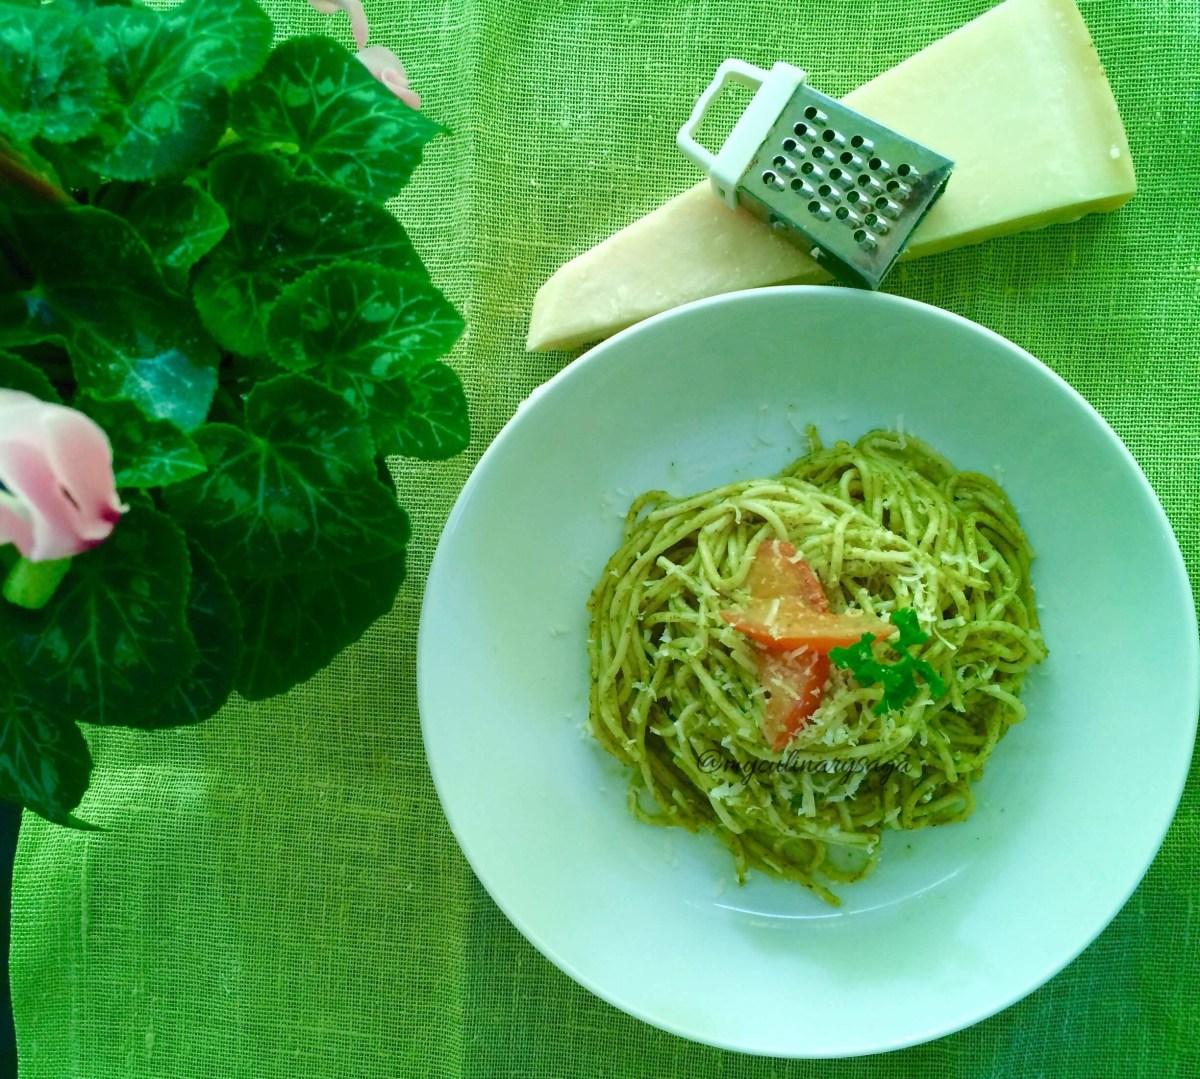 Basil Pesto Pasta with tomatoes